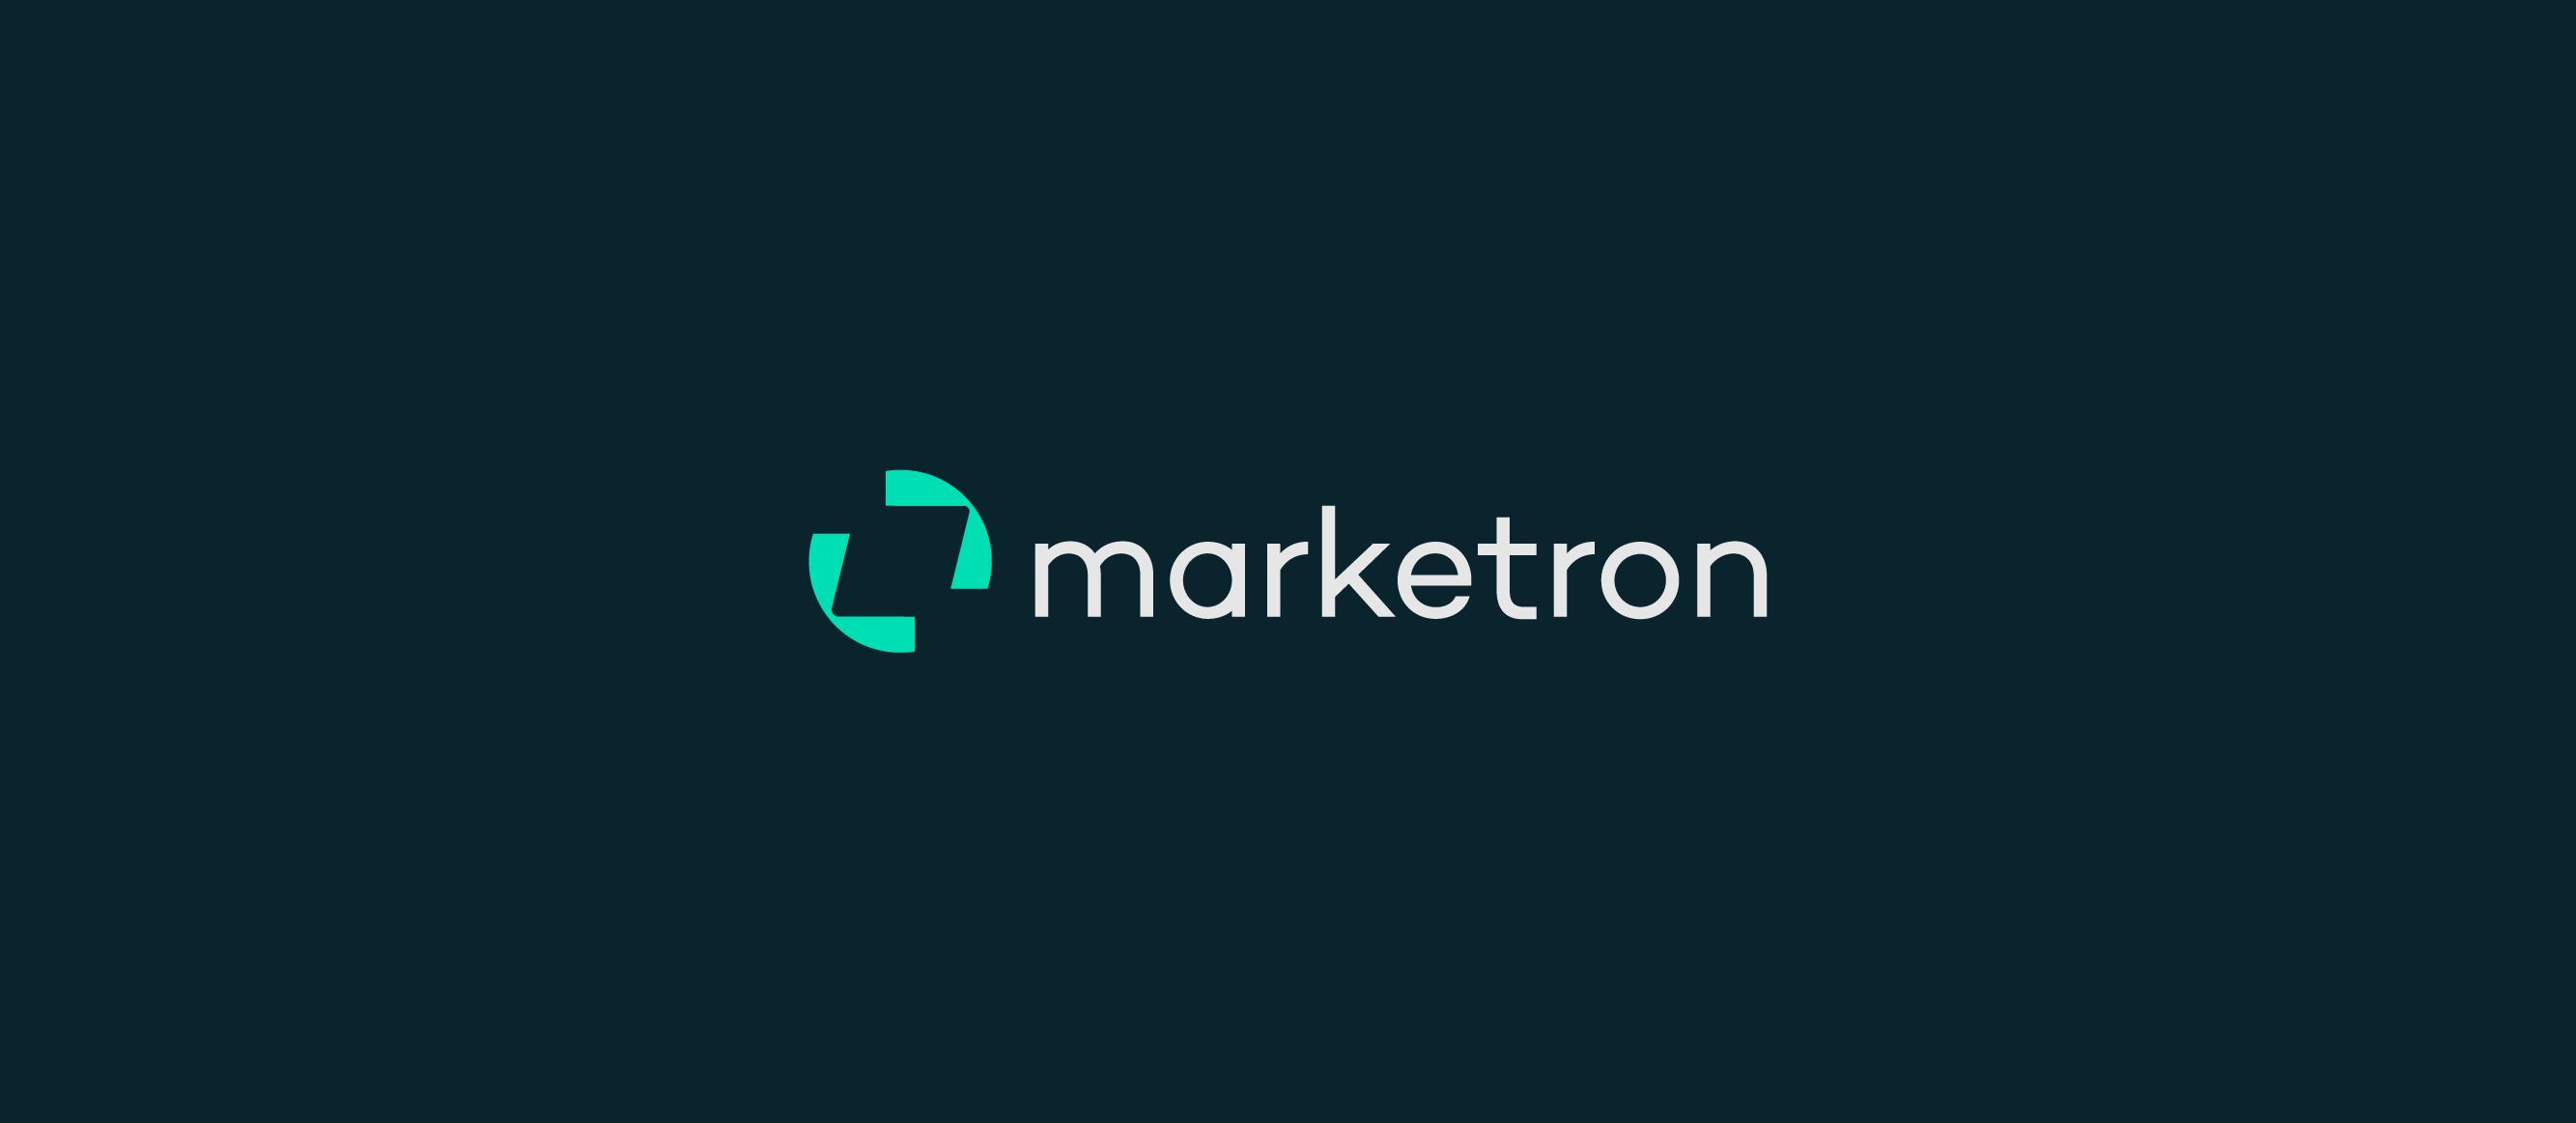 marketron-logo-design-identity-02